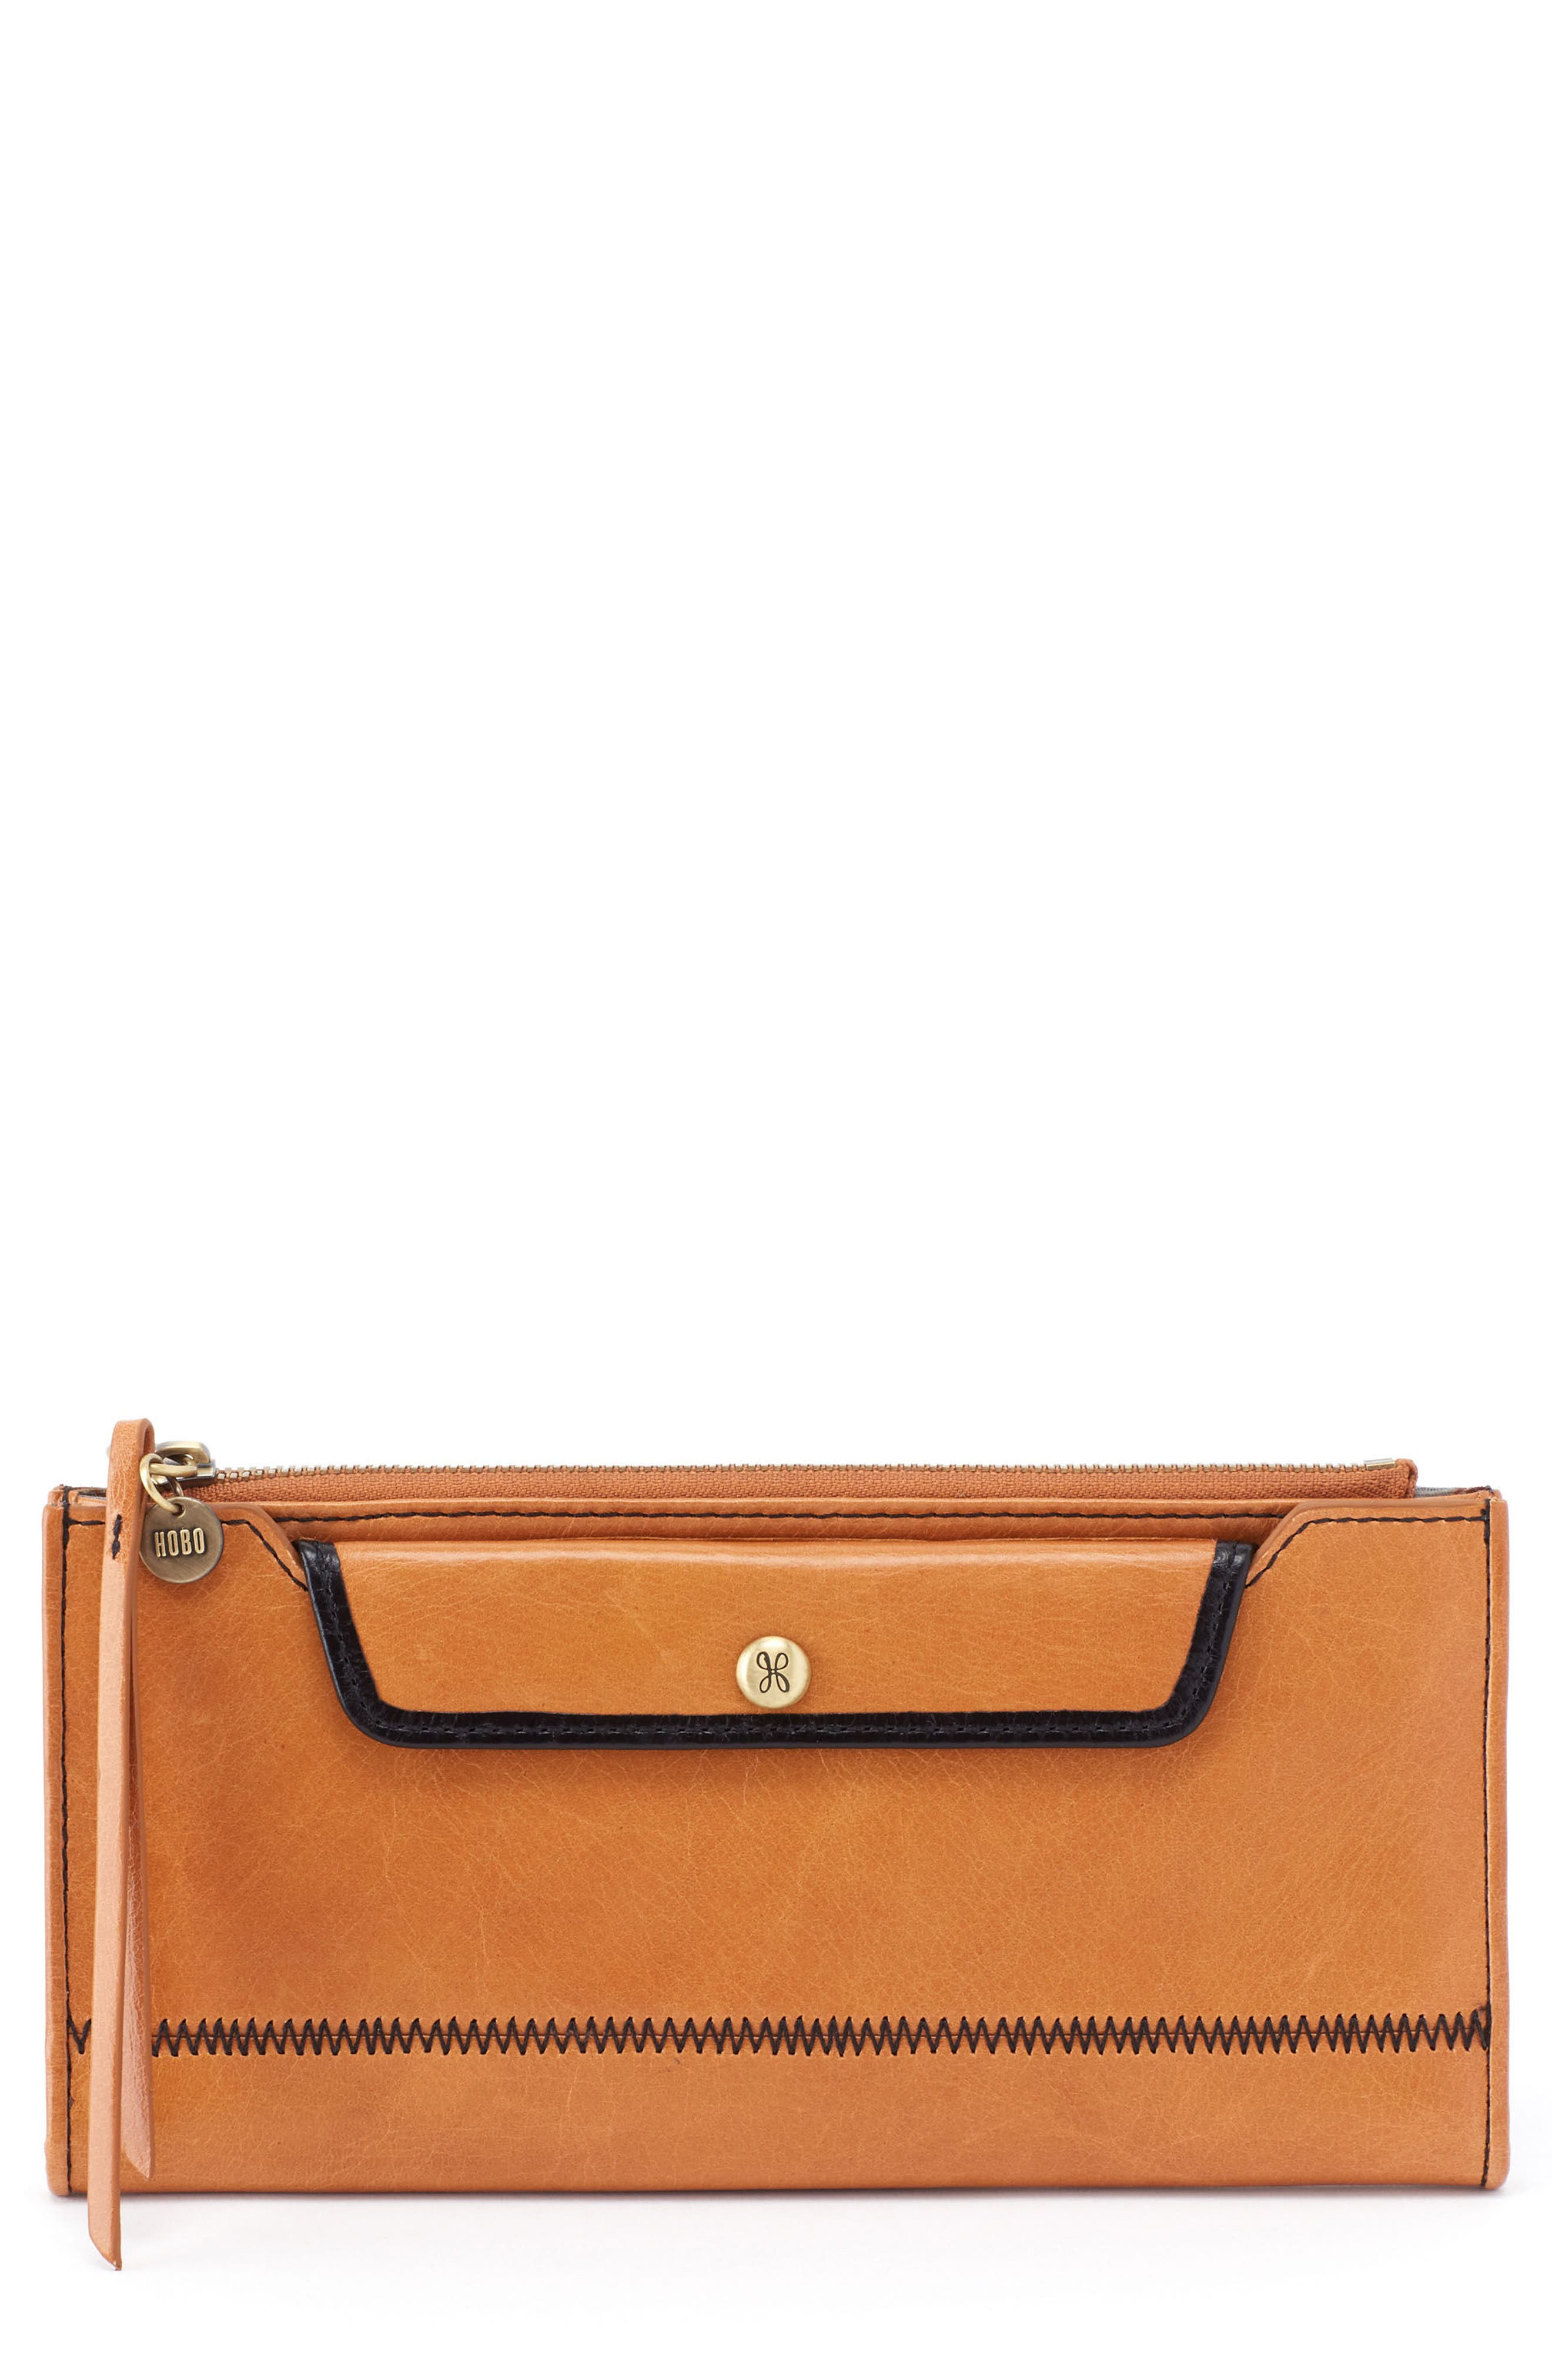 Hobo Orbit Continental Leather Wallet